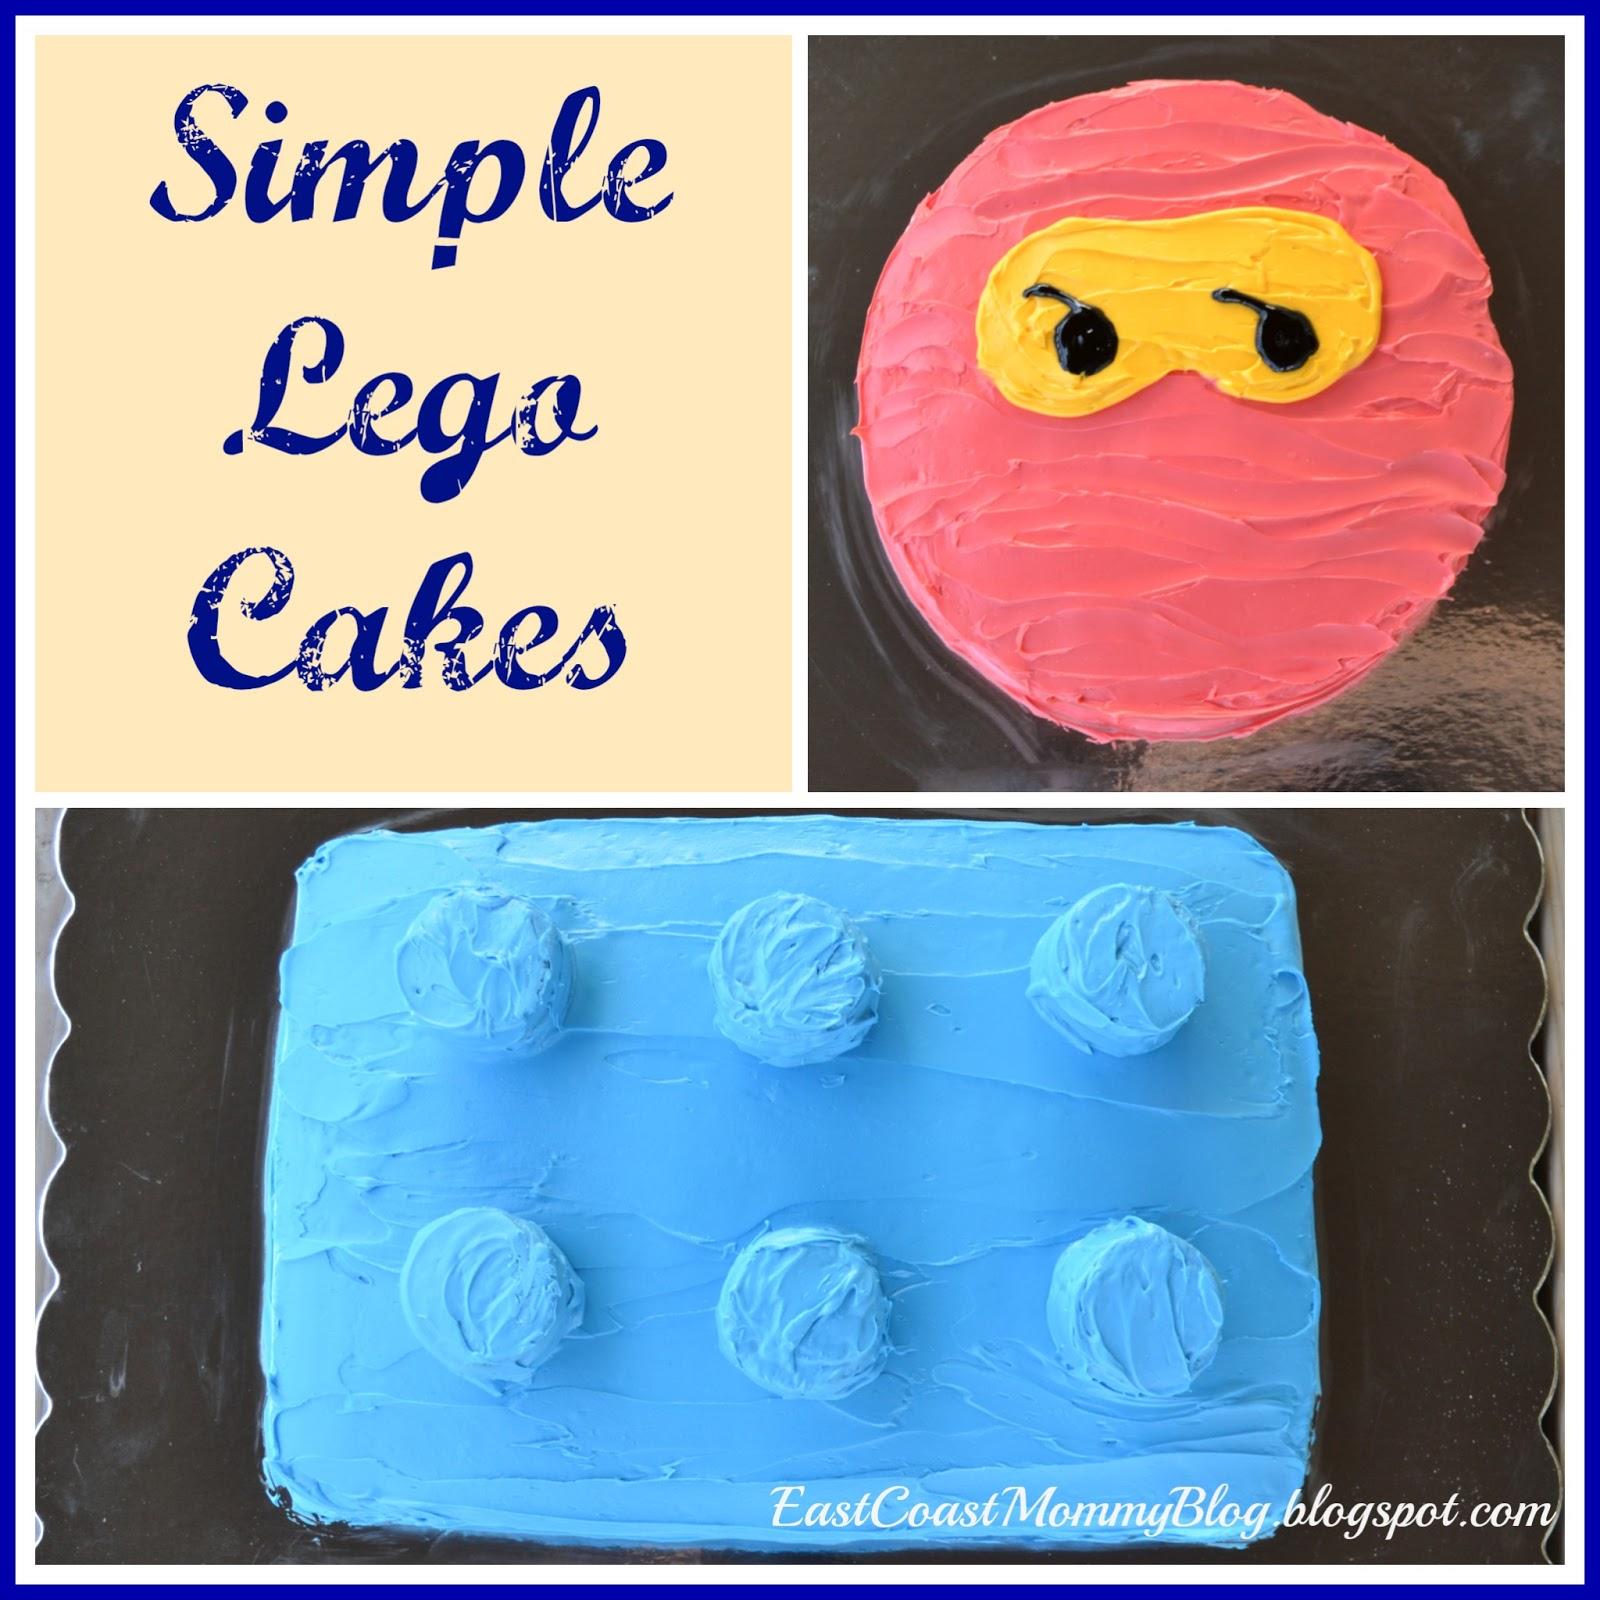 East Coast Mommy: Simple Lego Cakes